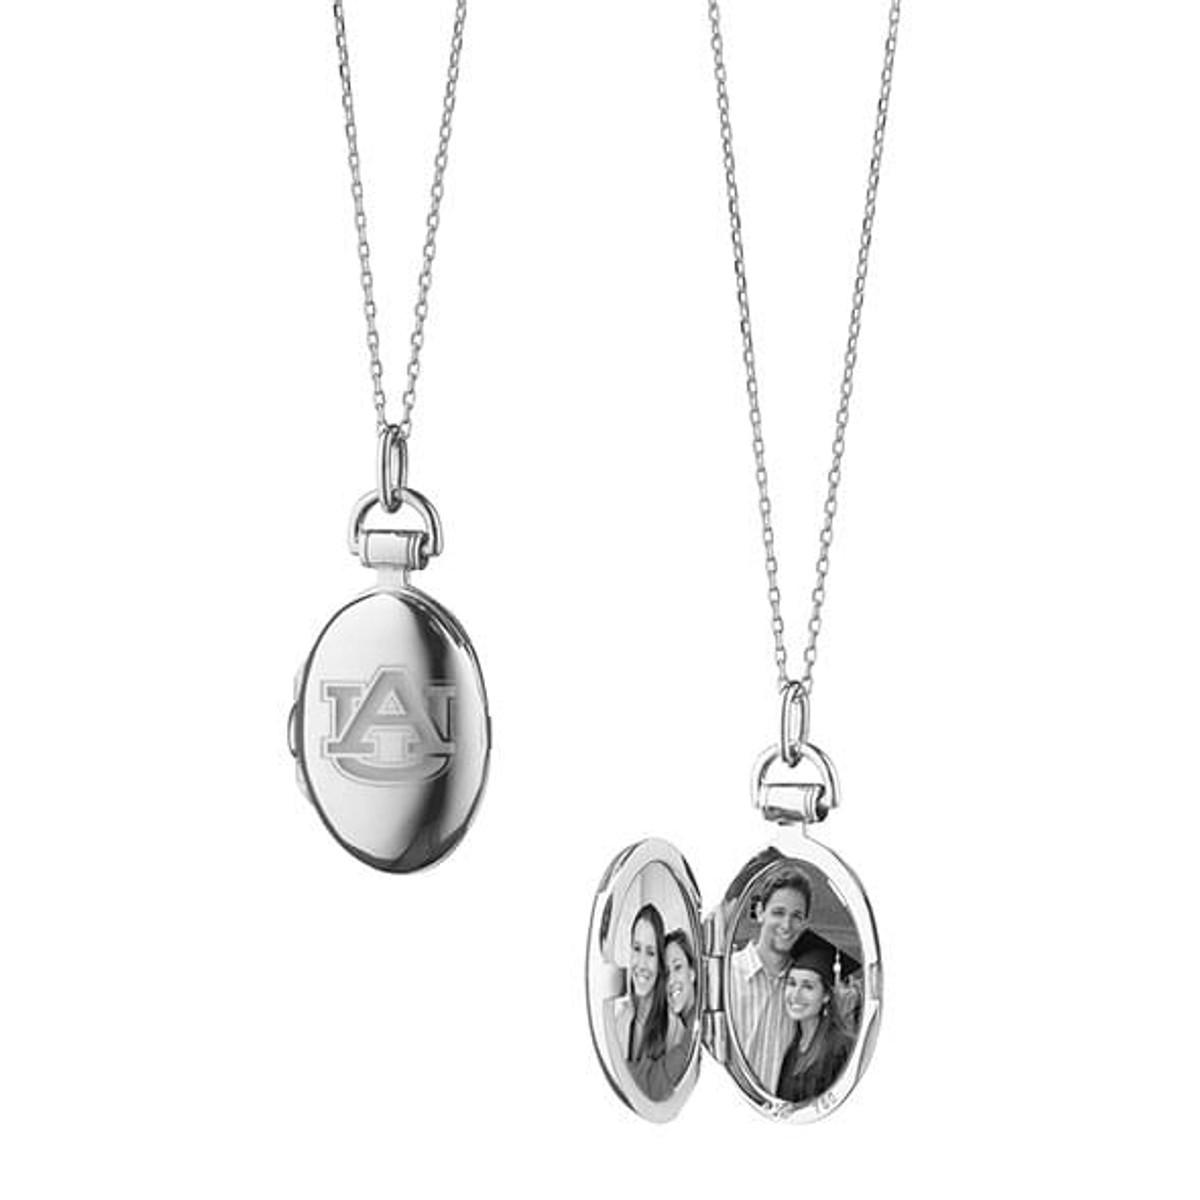 auburn monica rich kosann petite locket in silver at m